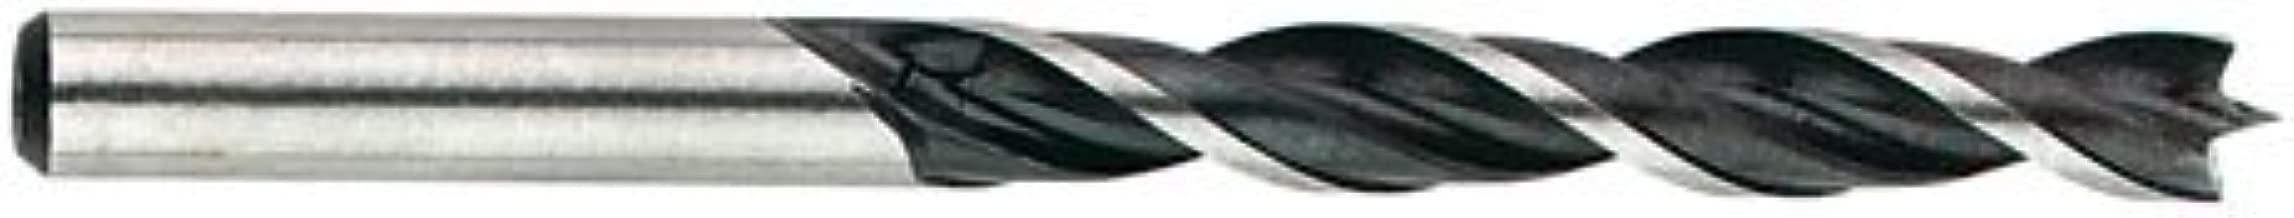 Metabo 627992000 1 CV-Holzbohrer 9x120 mm